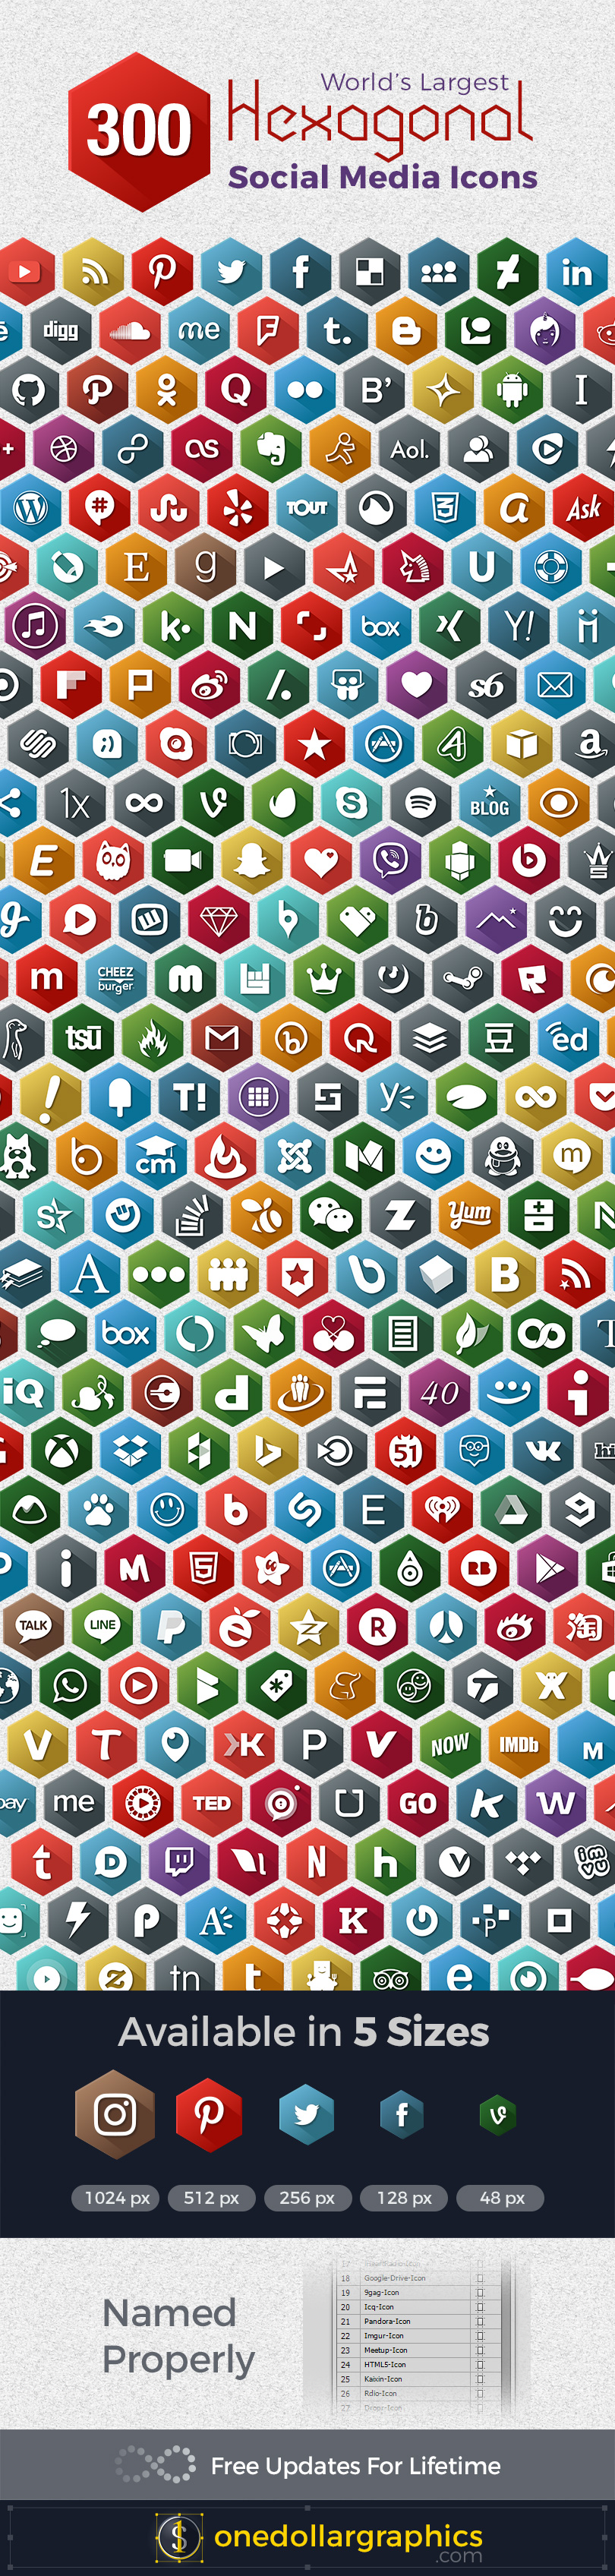 300-hexagonal-social-media-icons-png-ai-png